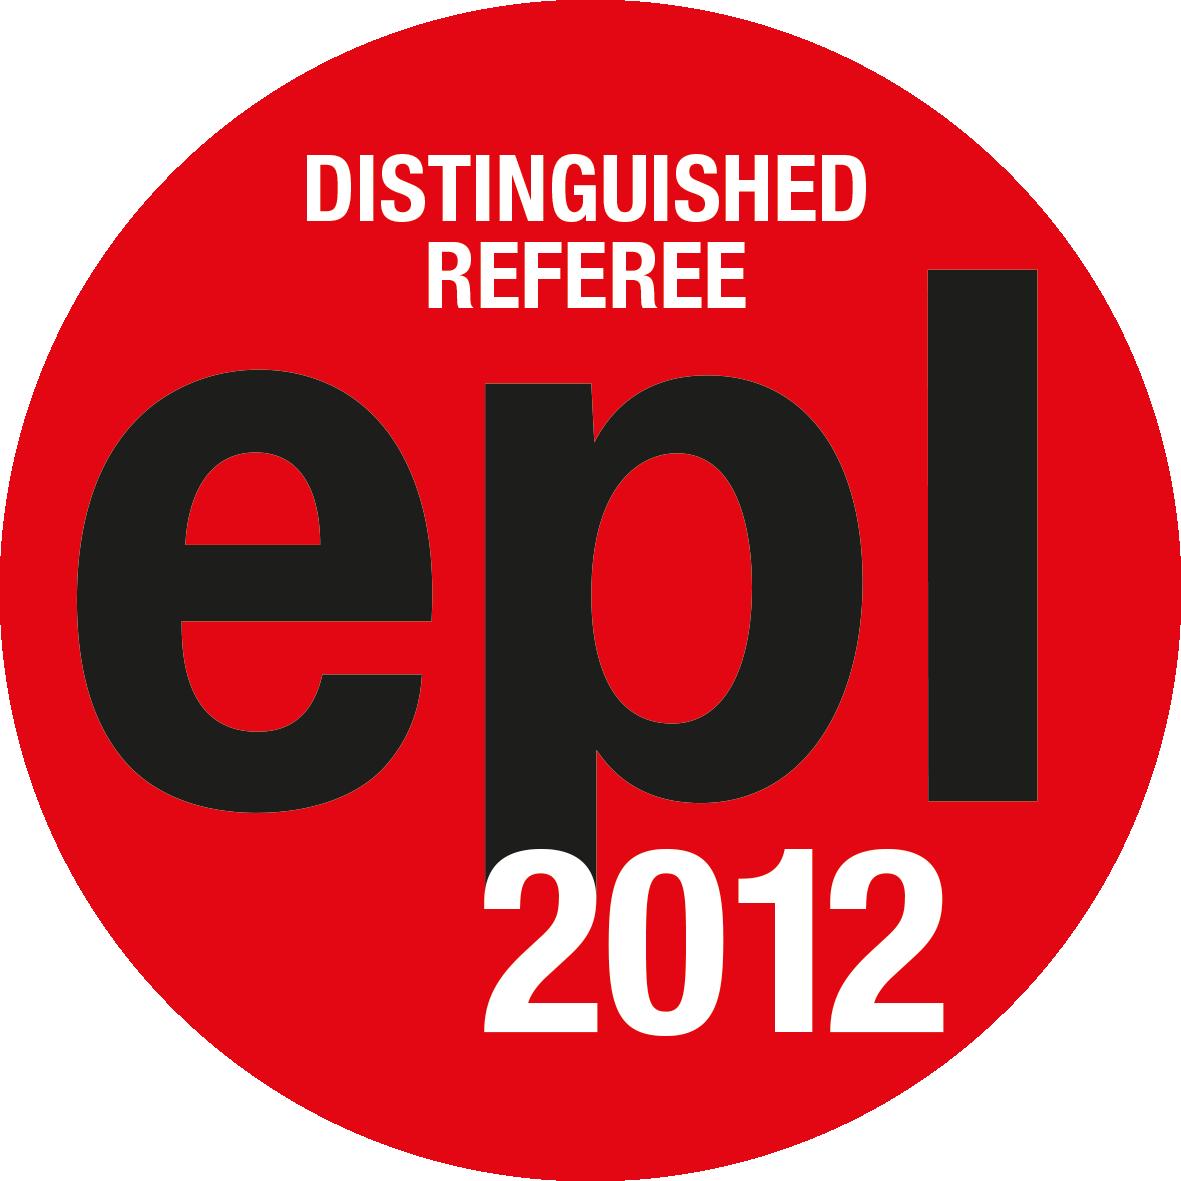 EPL Distinguished Referees 2012